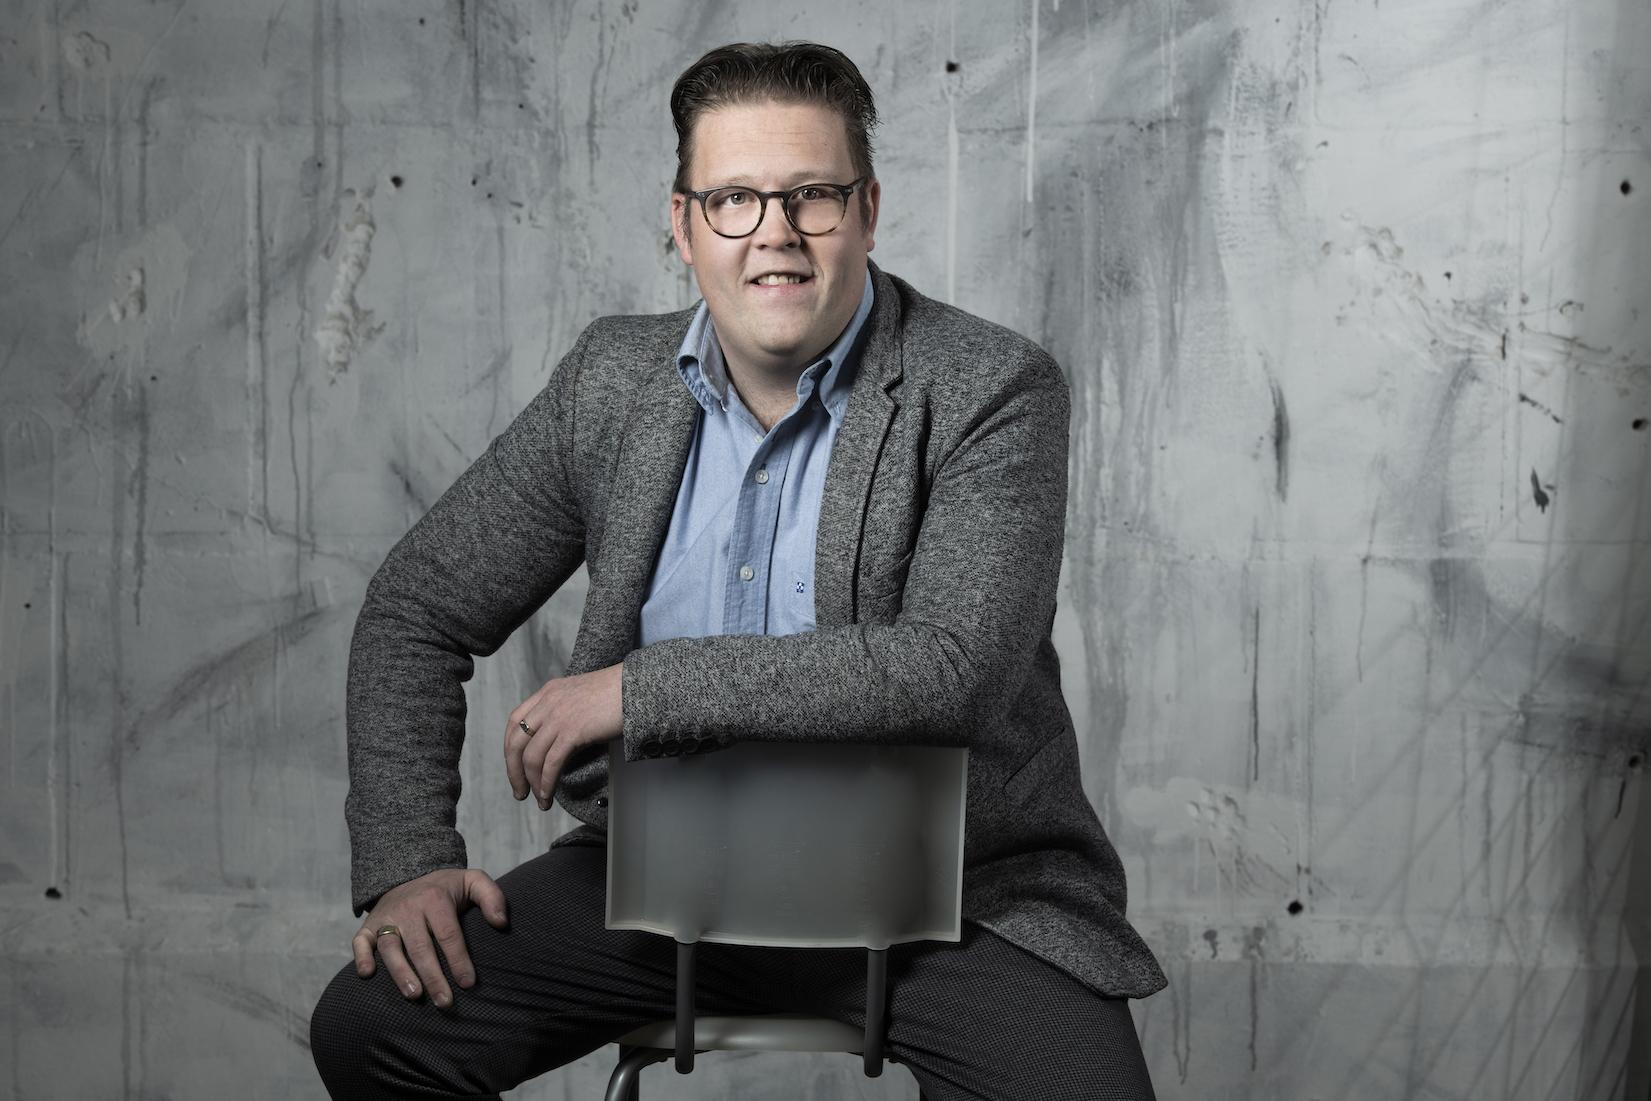 Rutger v Barneveld vervangt Mart Hoogkamer op Hollandse avond